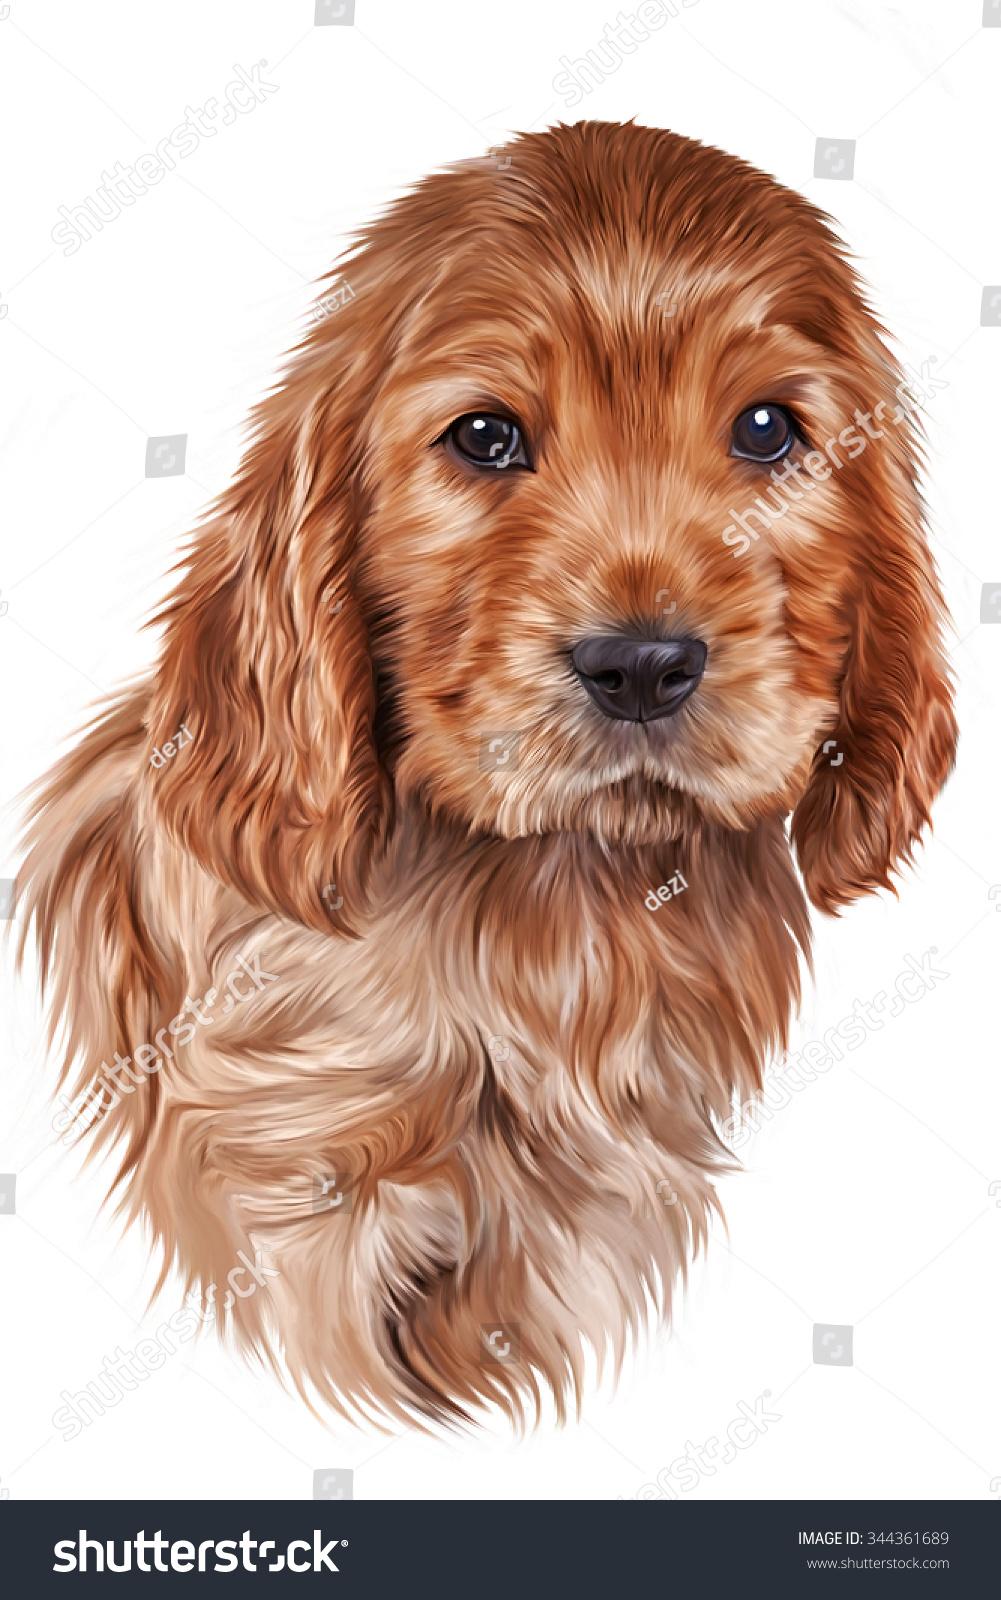 Drawing Dog, Puppy English Cocker Spaniel, Portrait On White Background